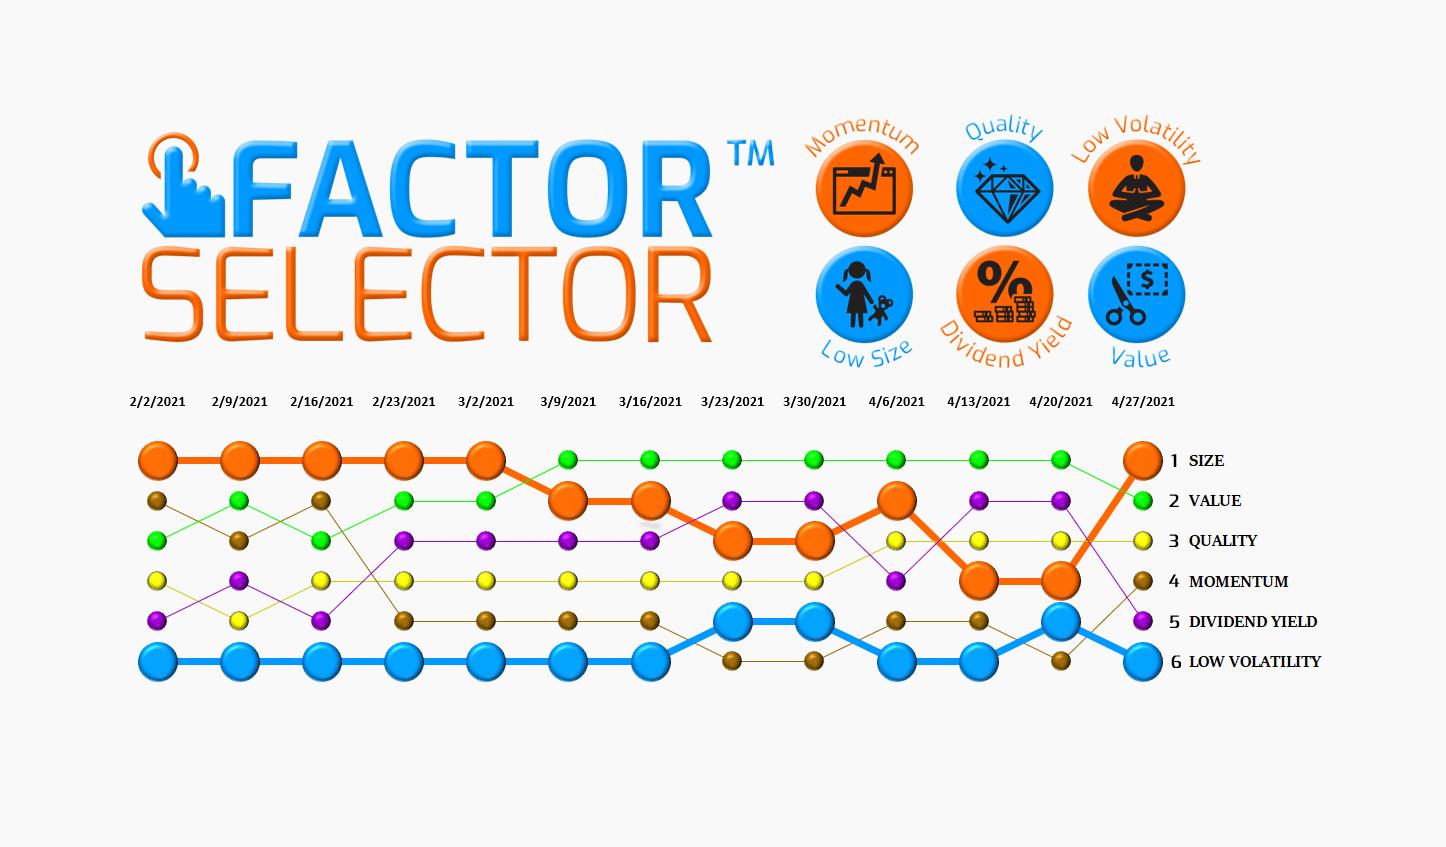 Factor Selector™  – 04/28/21 via @https://www.pinterest.com/market_scholars